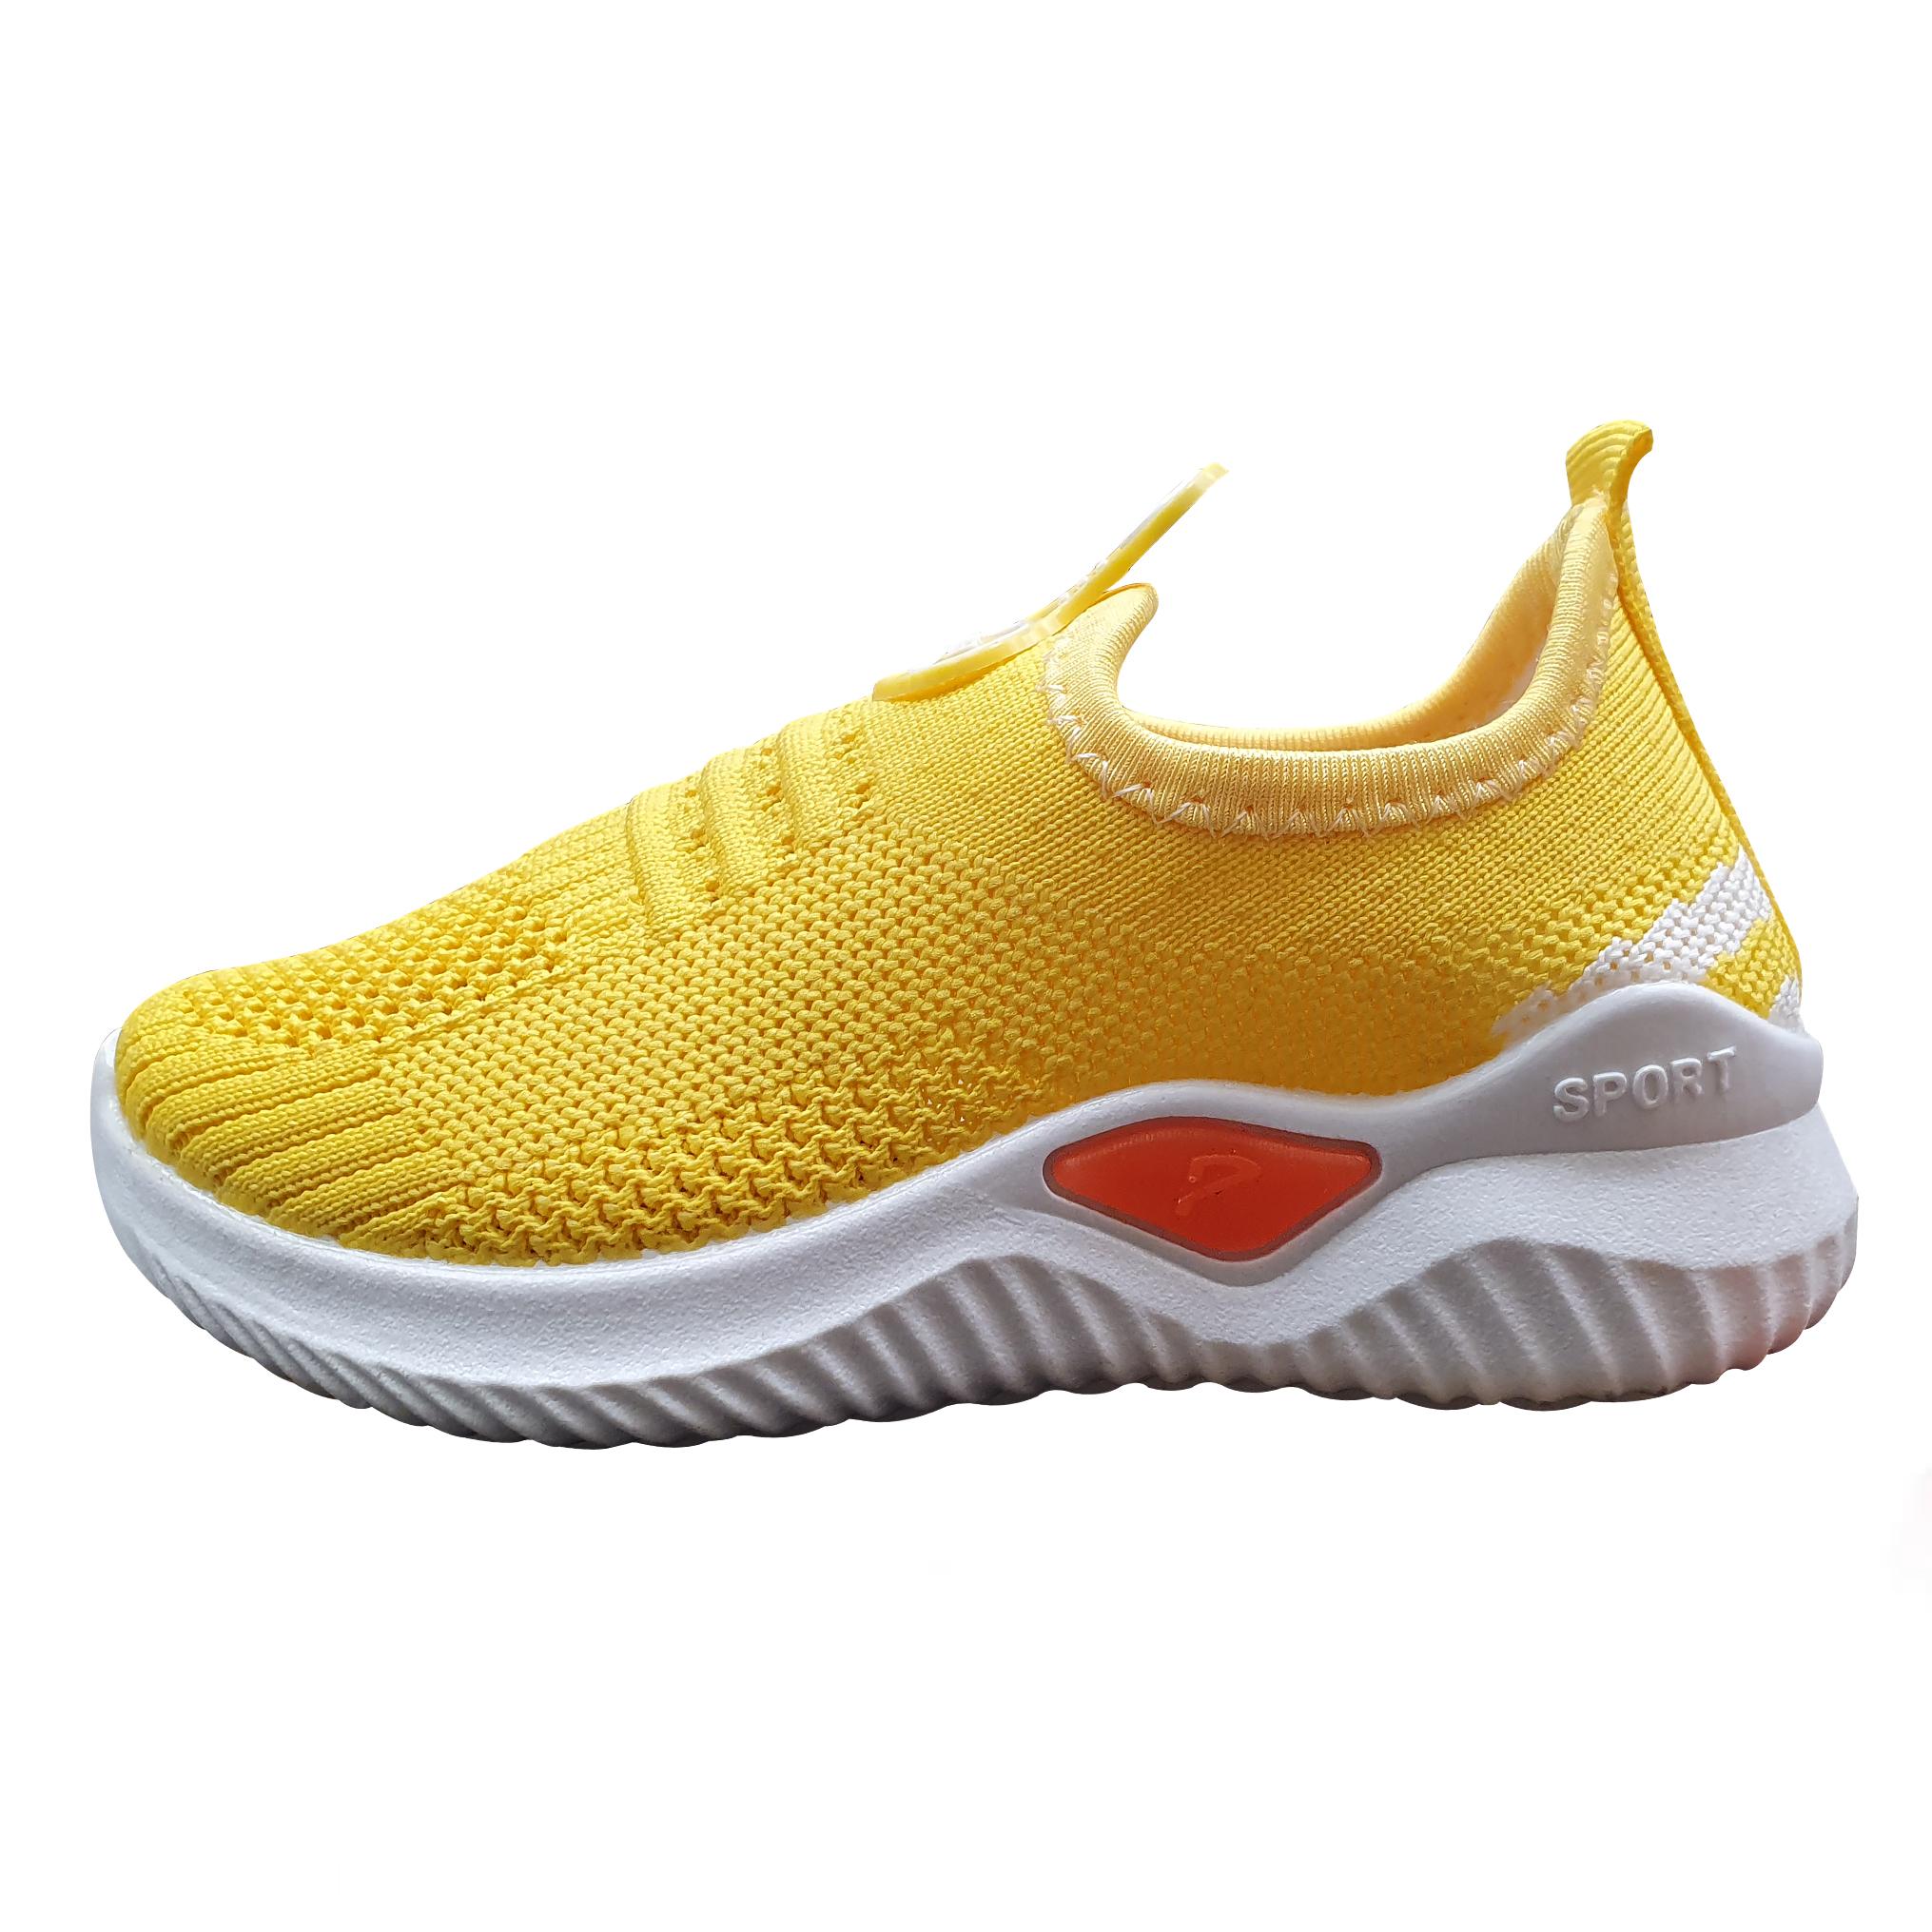 کفش راحتی پسرانه پاماکد ۱۴۵